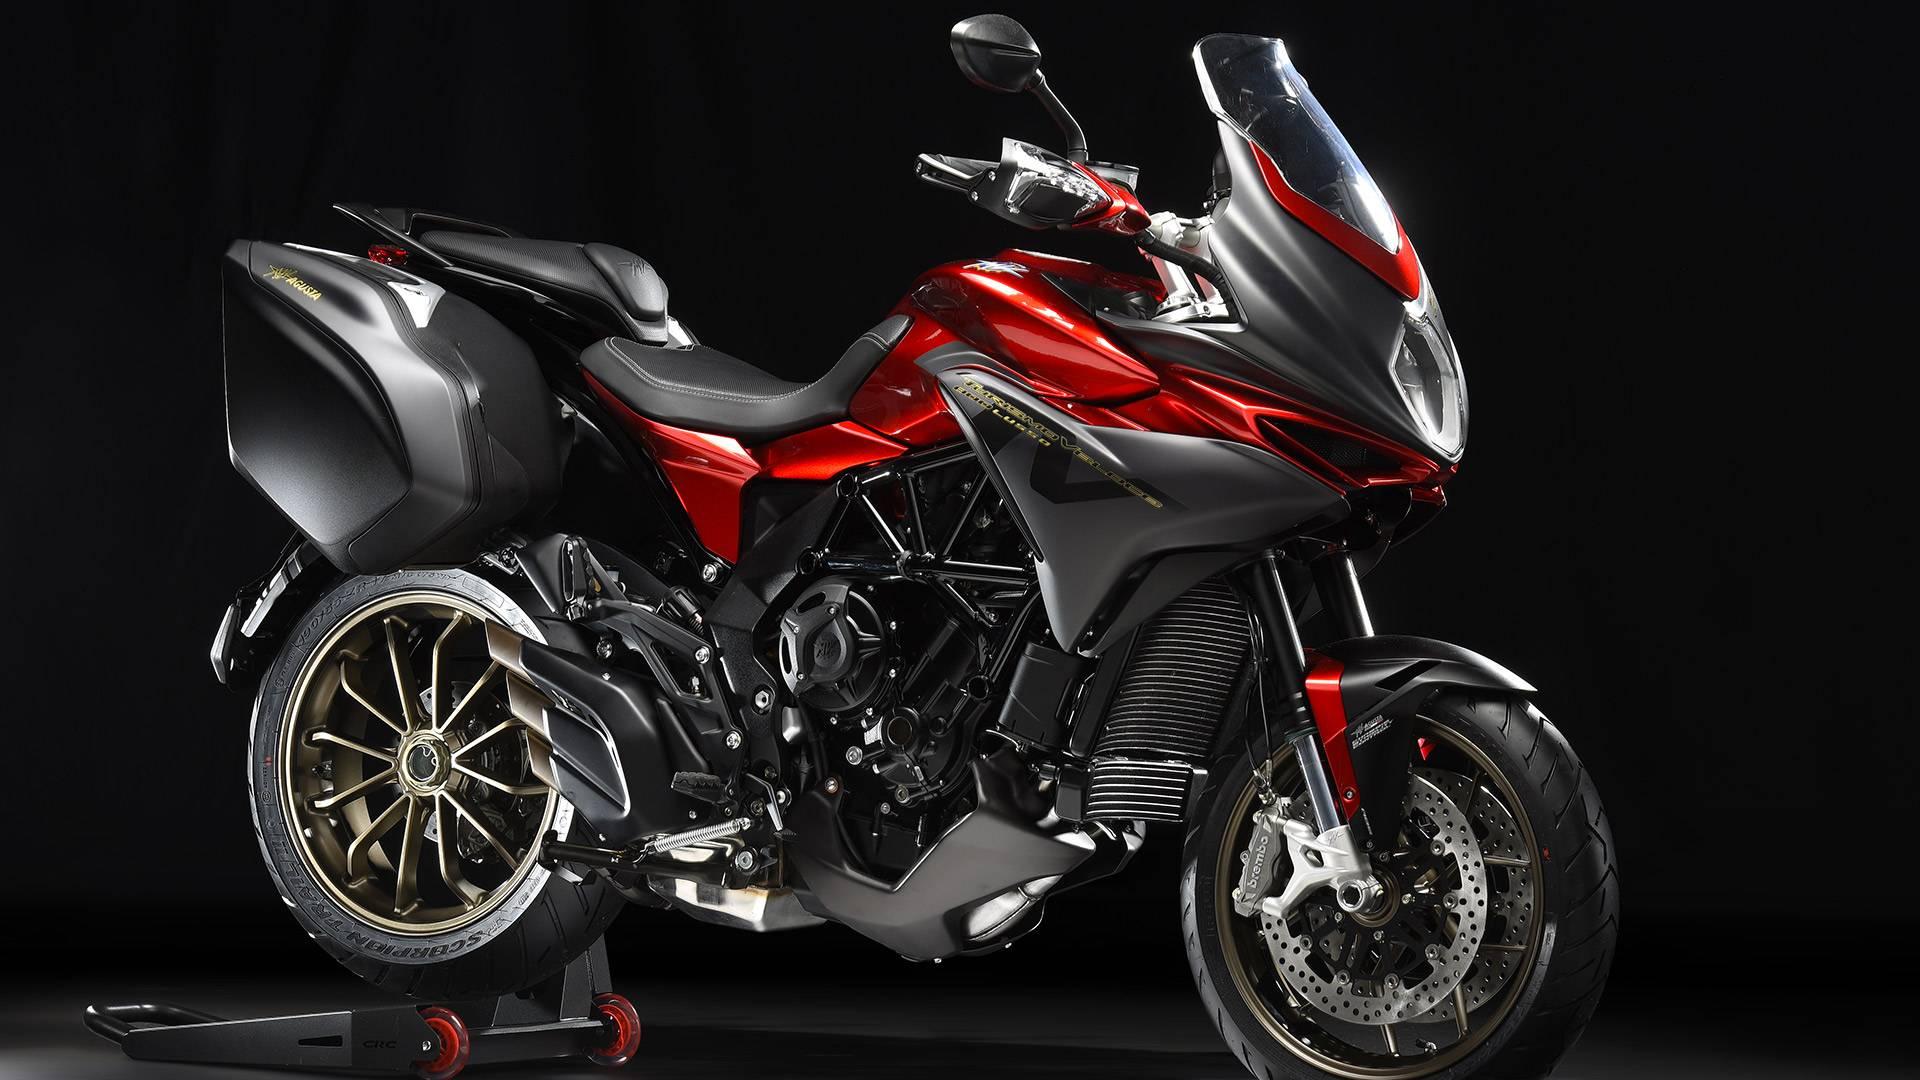 new 2019 mv agusta turismo veloce lusso motorcycles in marietta ga. Black Bedroom Furniture Sets. Home Design Ideas